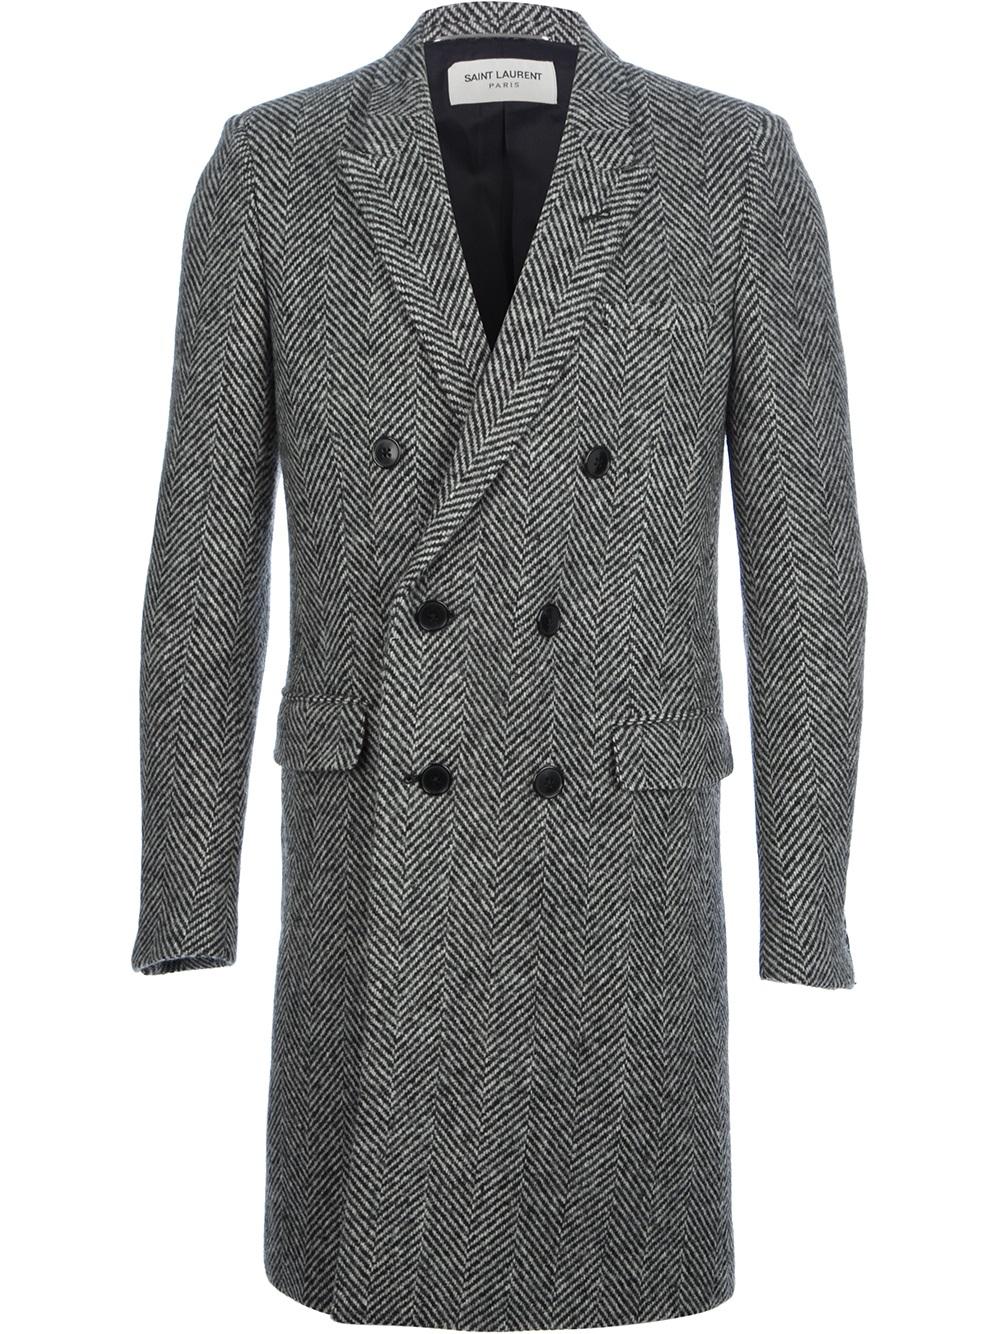 Saint Laurent Double Breasted Herringbone Coat In Grey